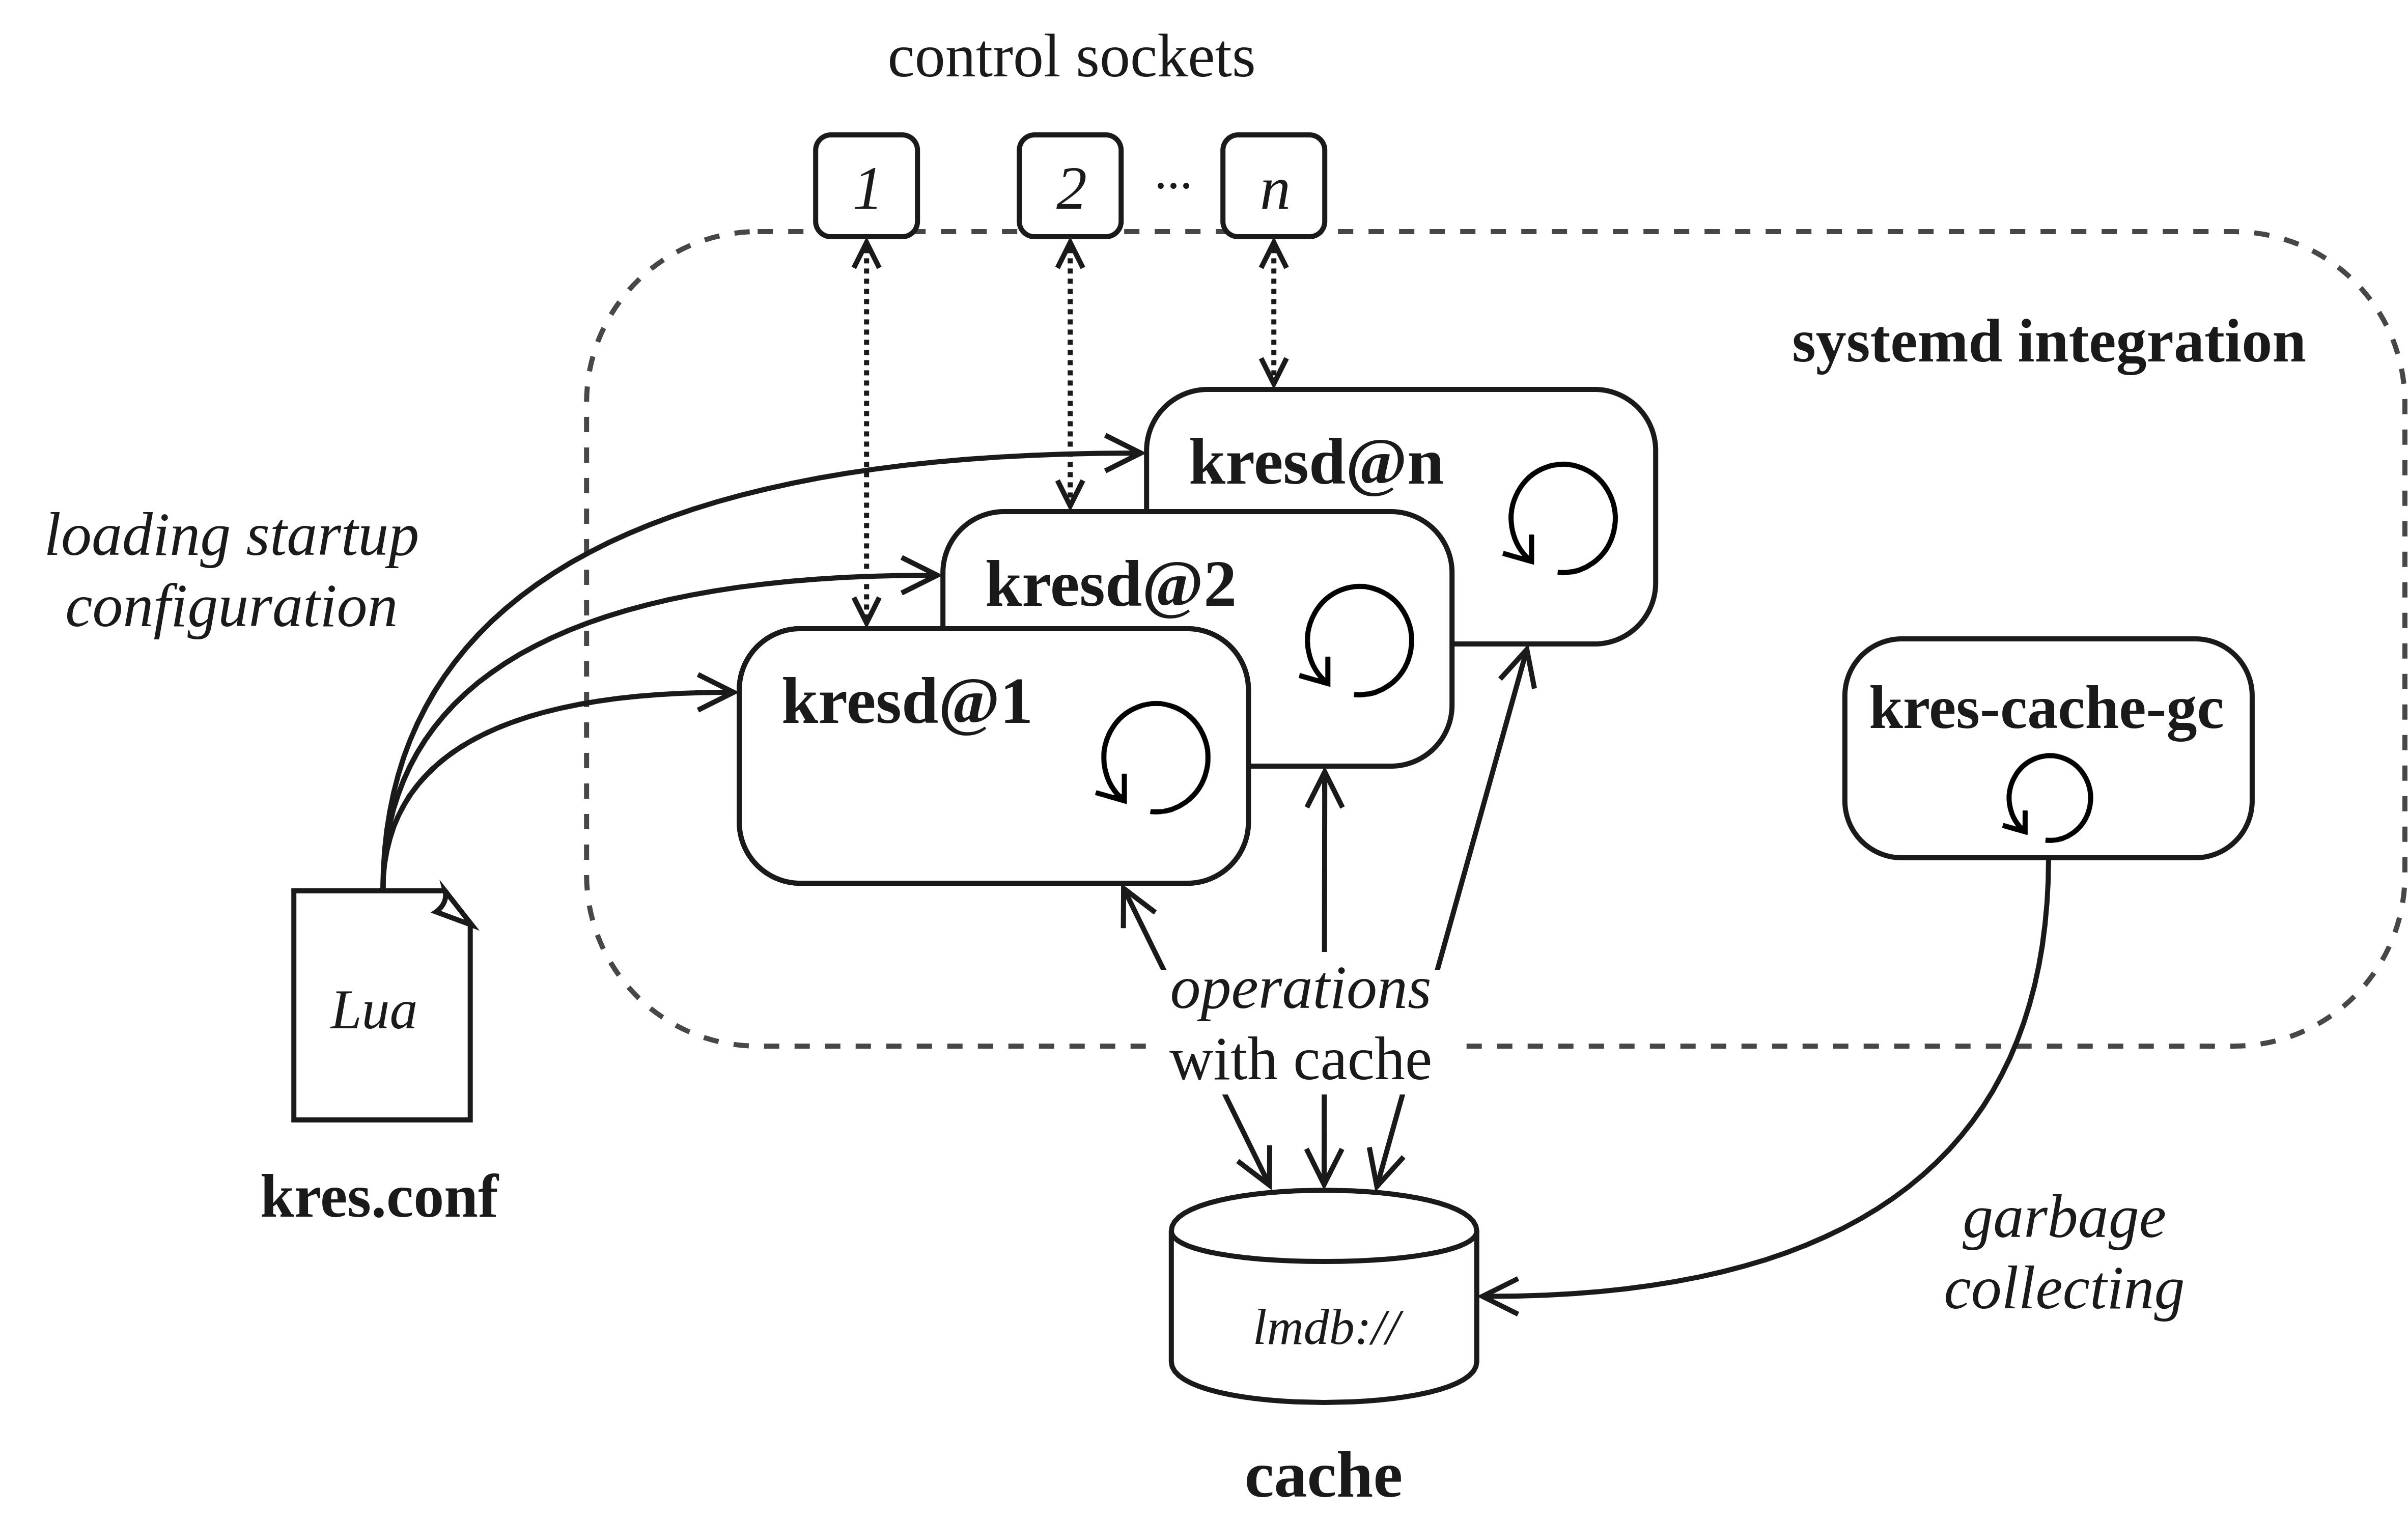 doc/kres-architecture.png